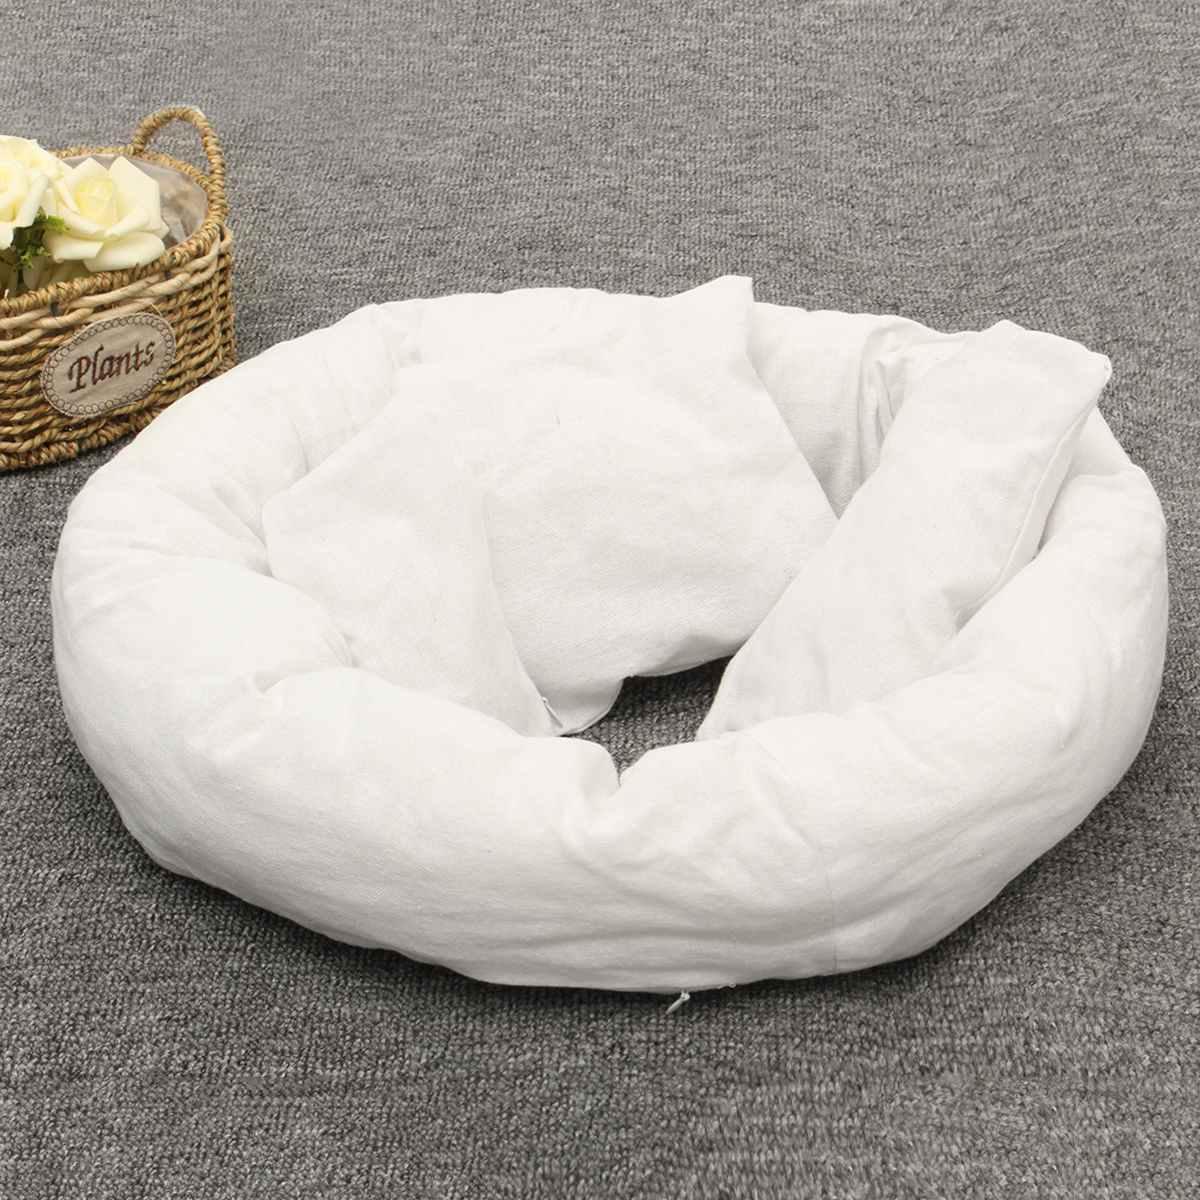 anel forma redonda travesseiro foto do bebê